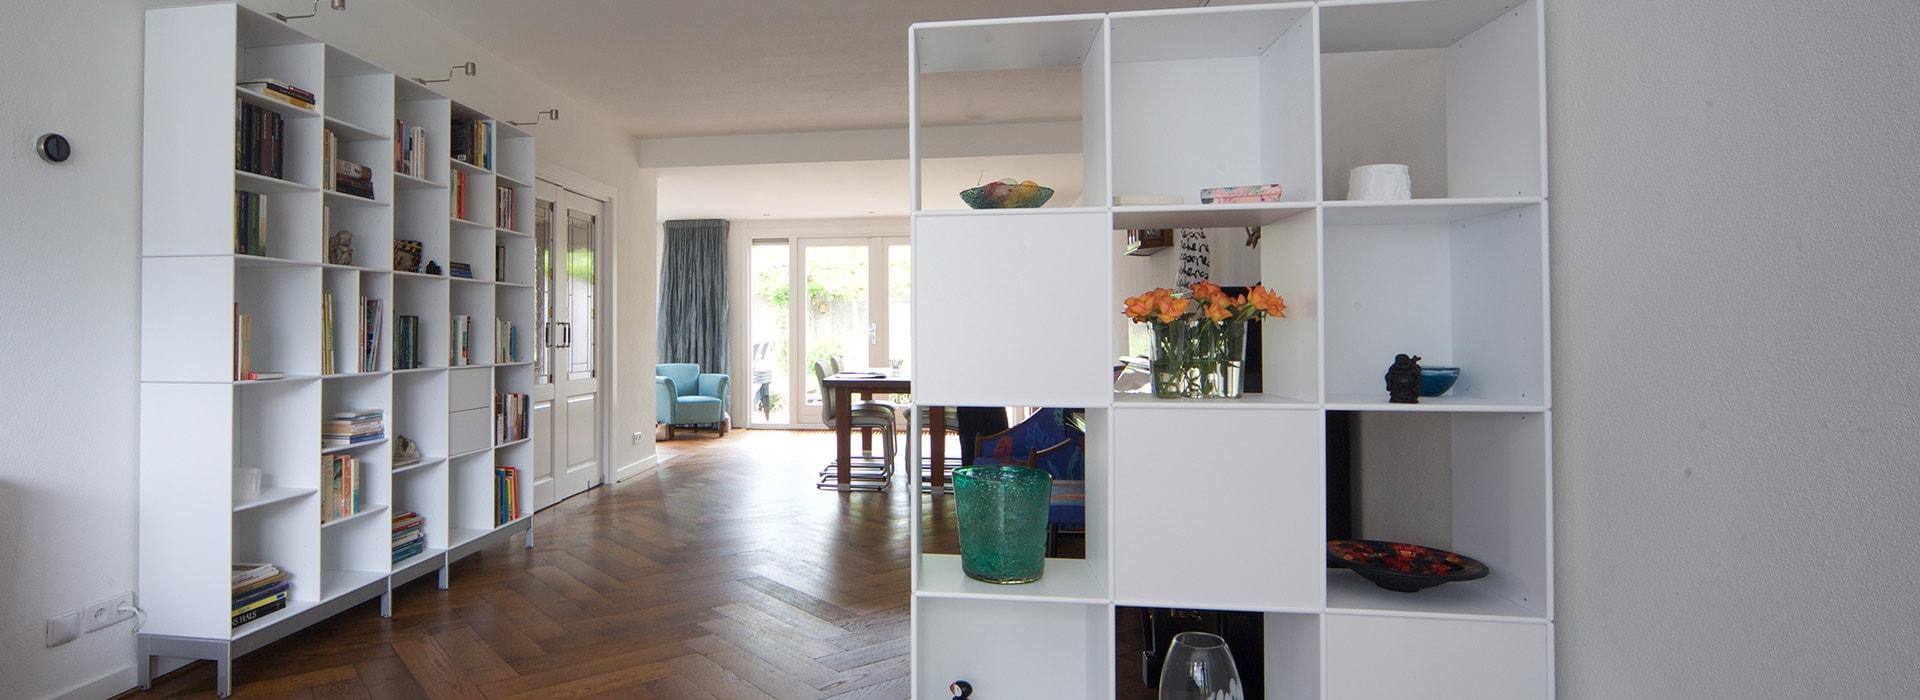 ABC Quadrant boekenkast en roomdivider, lak zuiverwit